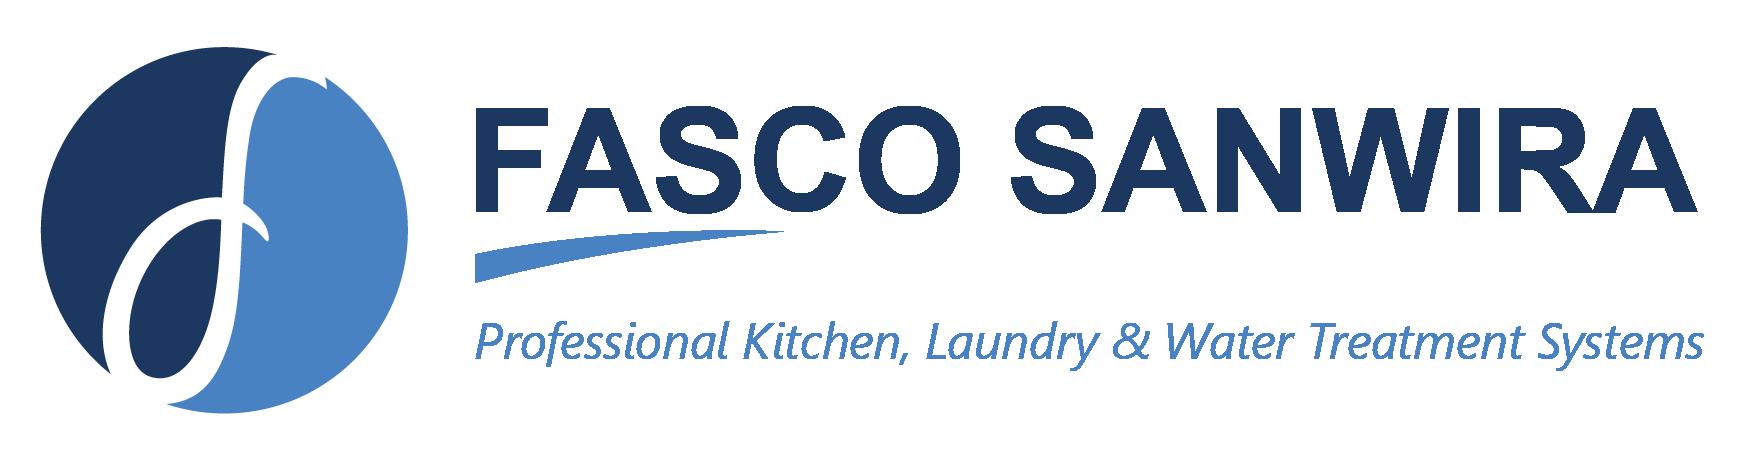 PT.FascoSanwira | Kitchen,Laundry Equipment,Accessories, Spareparts in Jakarta Surabaya Bali, Indonesia